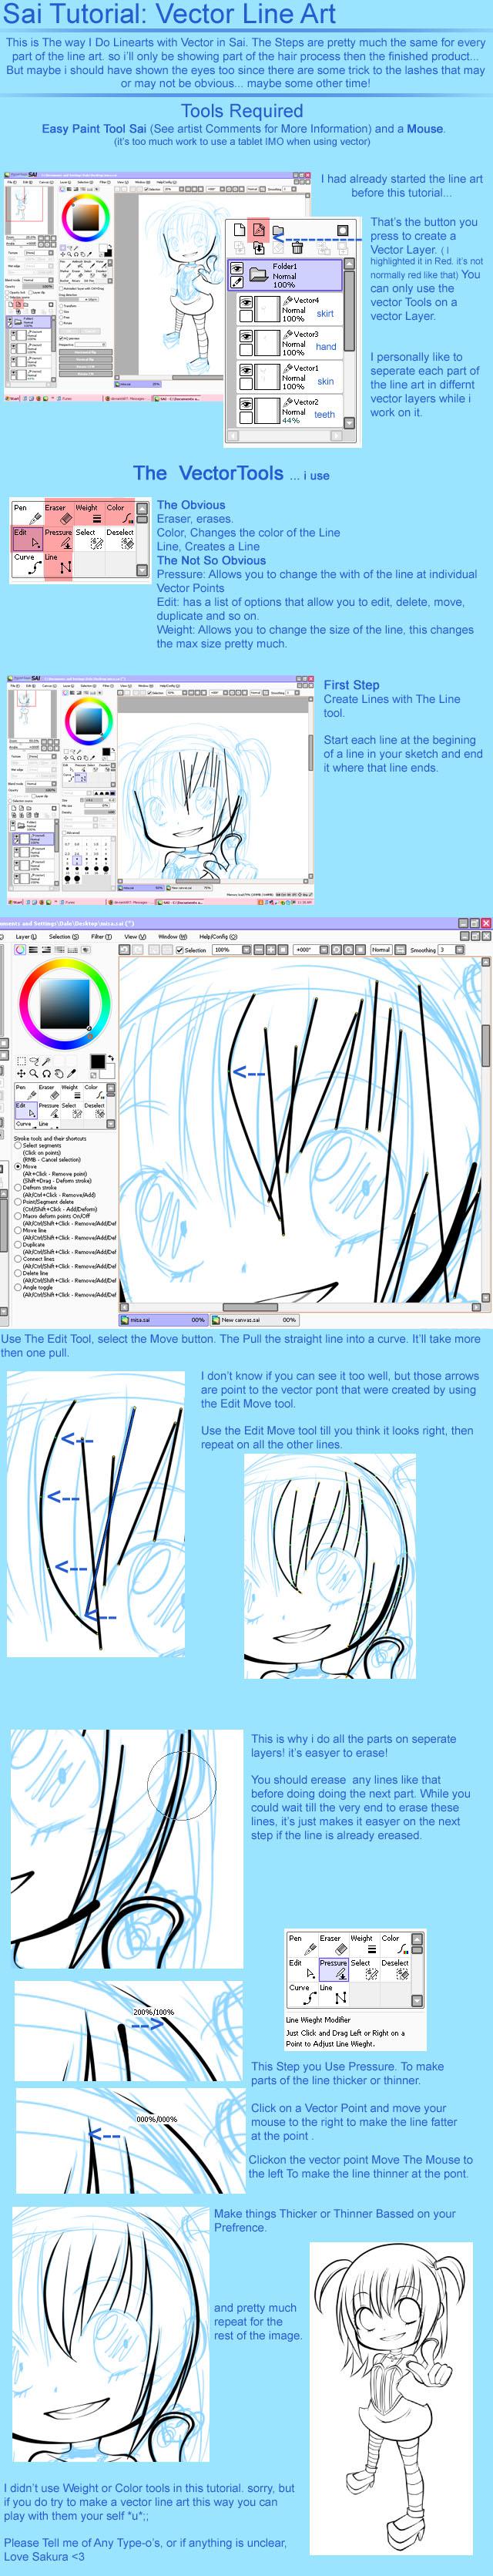 Sai tutorial vector line art by sakurachan776 on deviantart sai tutorial vector line art by sakurachan776 baditri Gallery